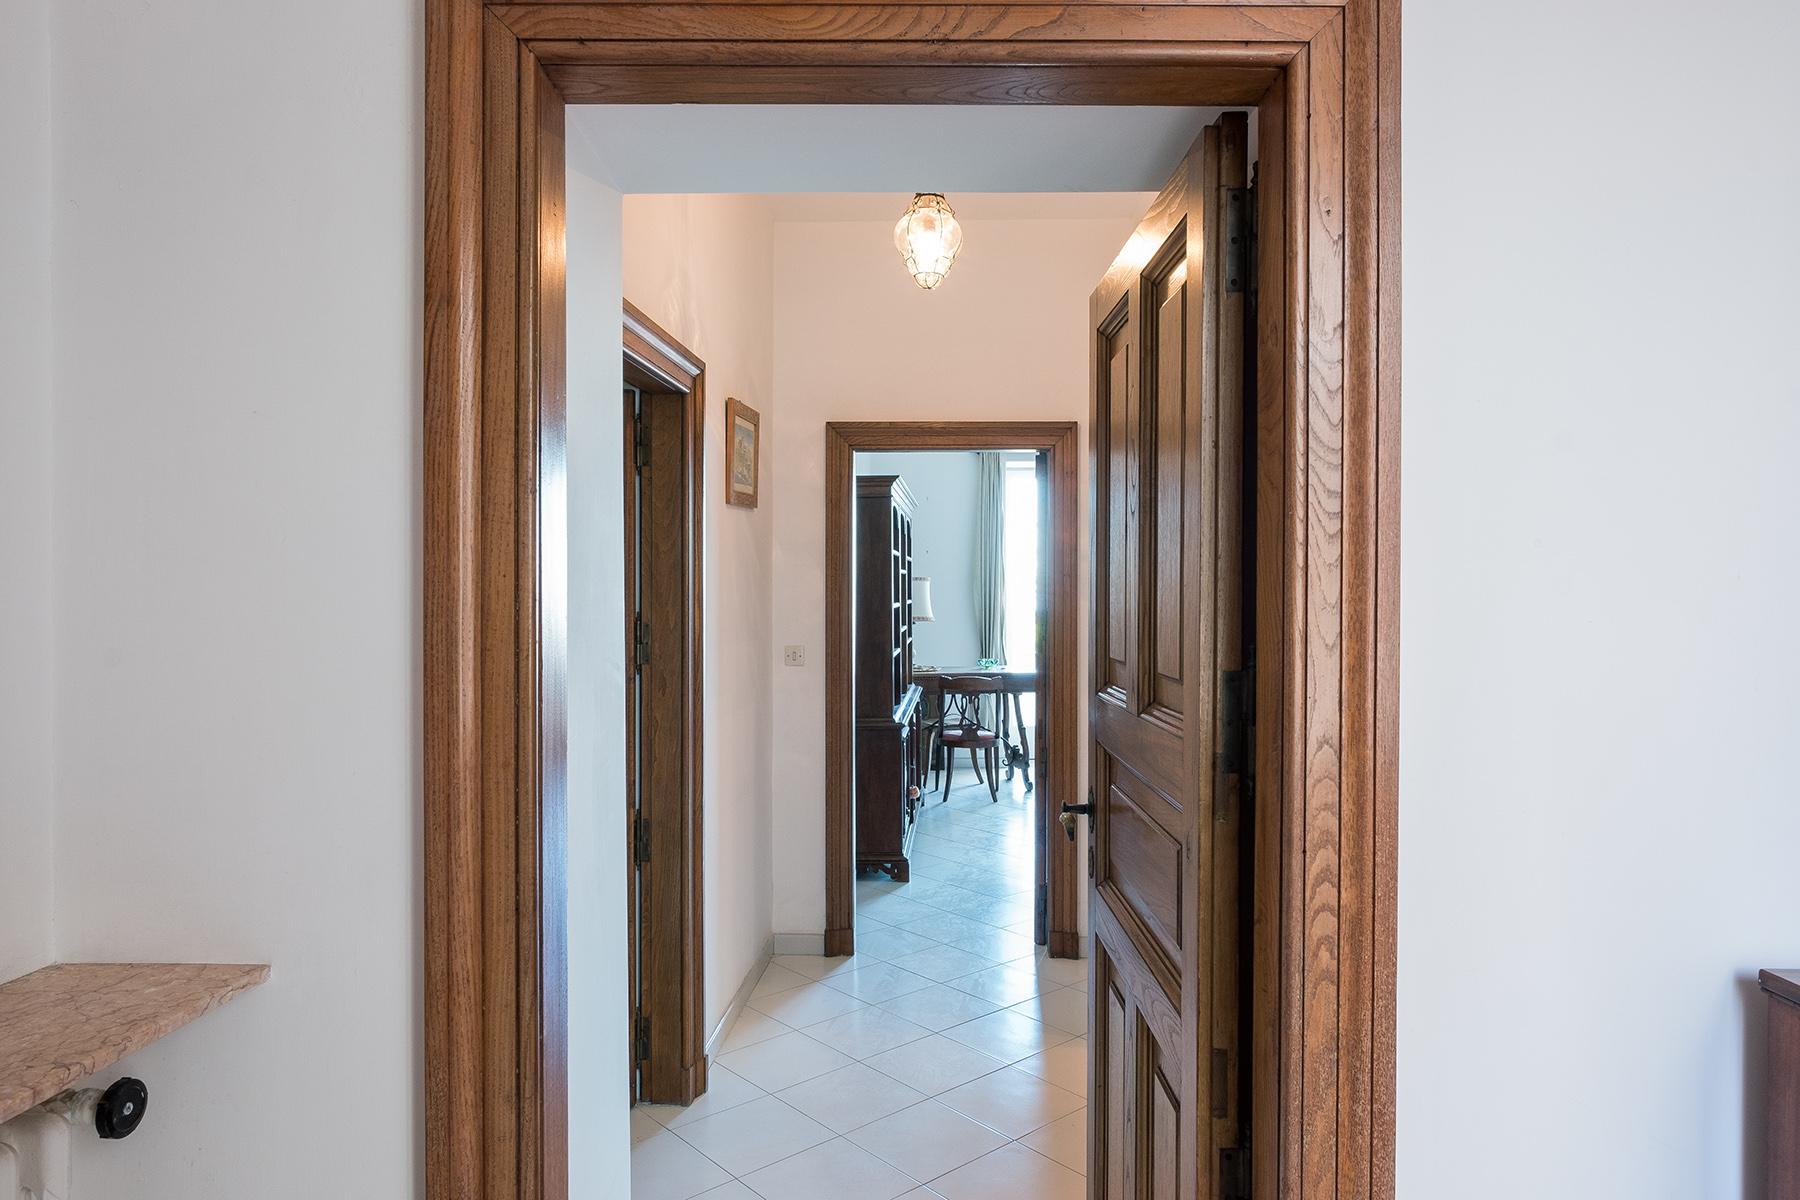 Casa indipendente in Vendita a Capri: 5 locali, 400 mq - Foto 17